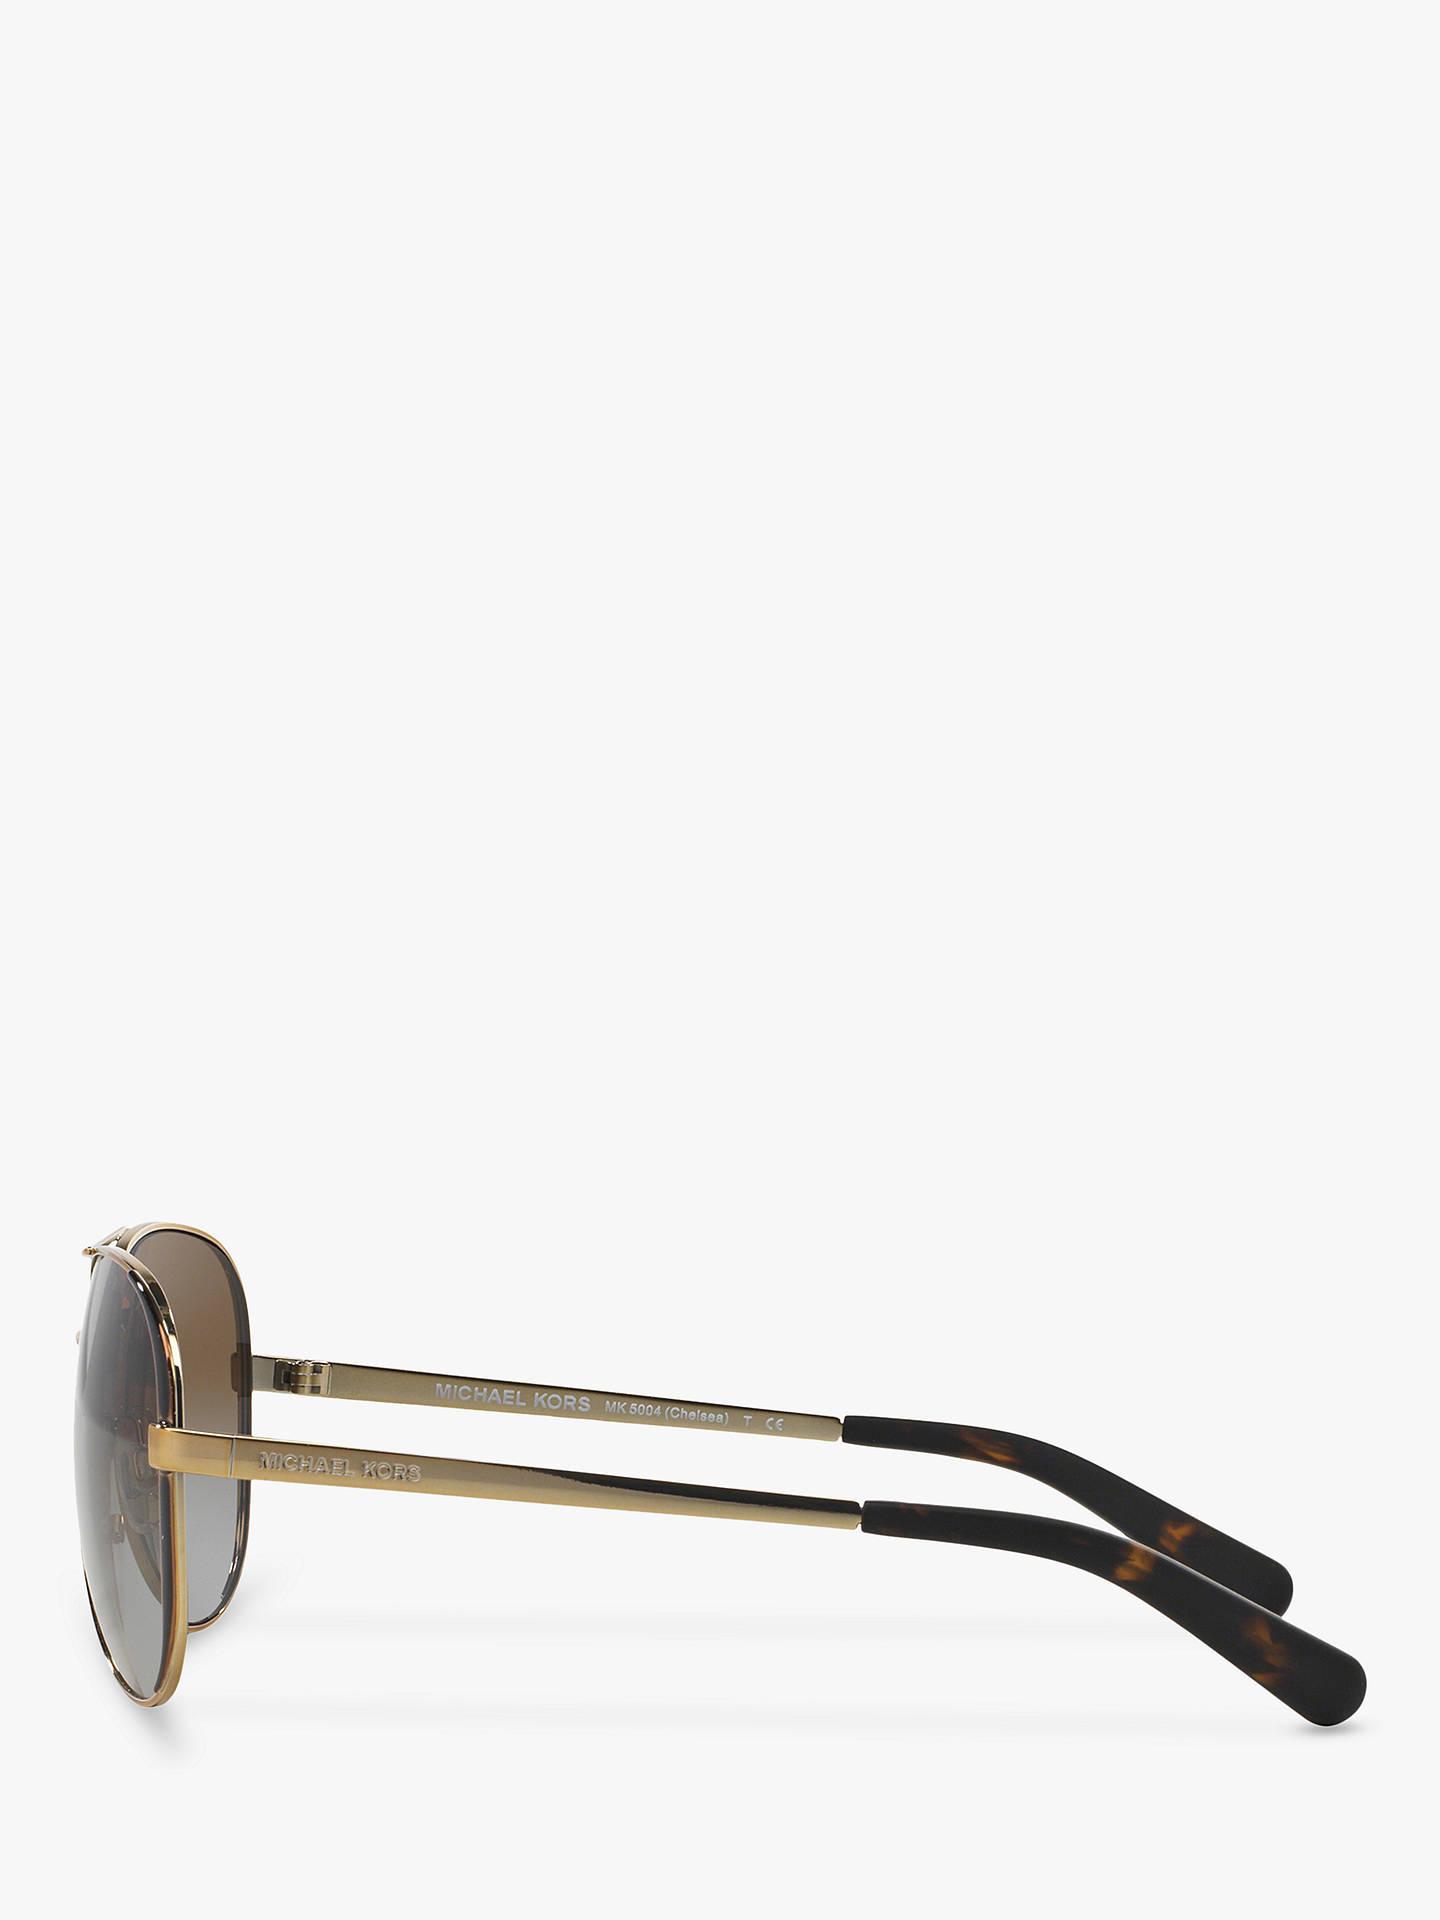 36074ca150077 ... Buy Michael Kors MK5004 Chelsea Polarised Aviator Sunglasses